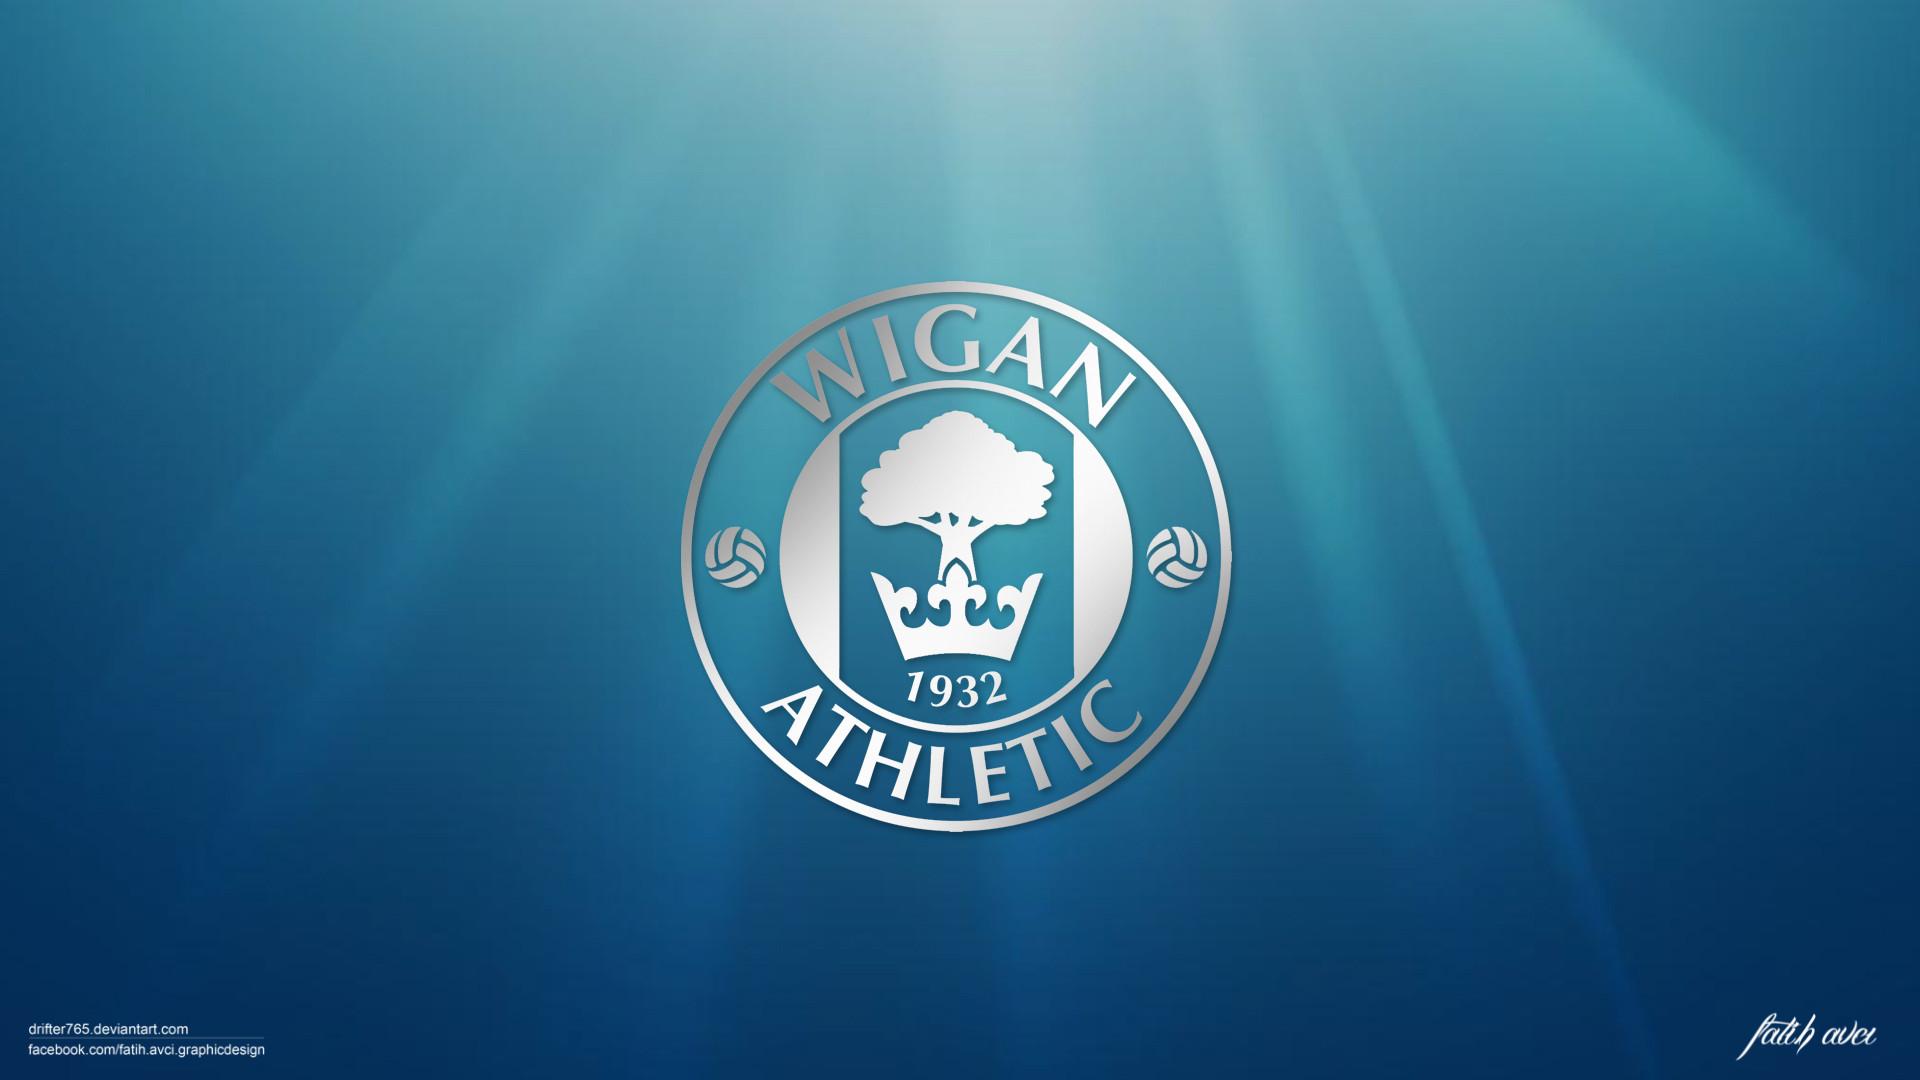 Wigan Athletic Football Wallpaper